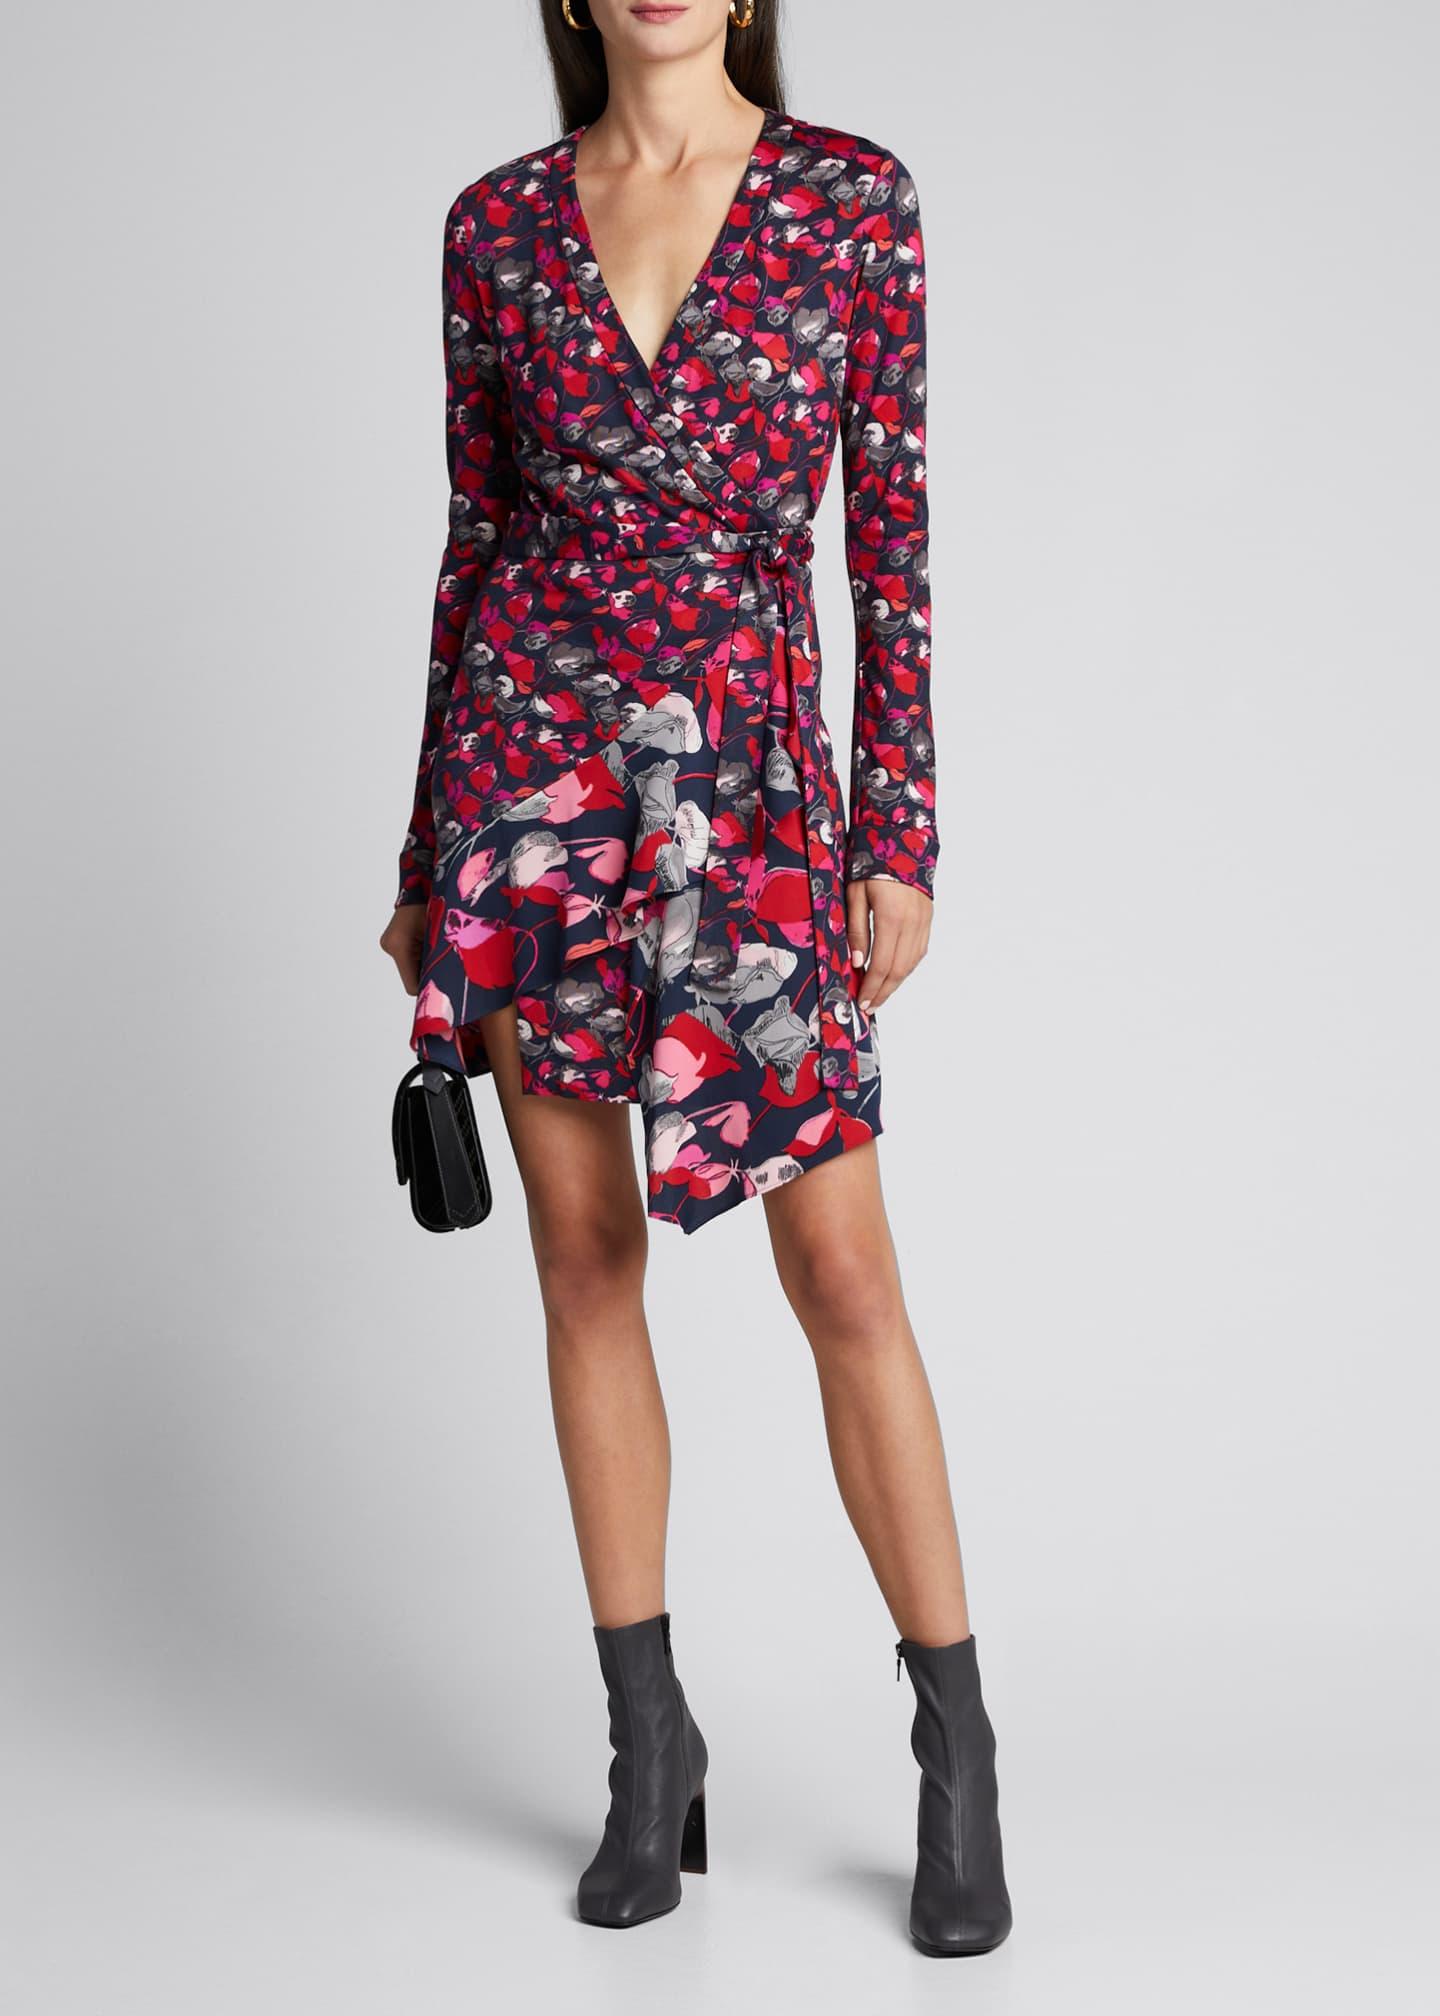 Diane von Furstenberg Elita Floral Long-Sleeve Asymmetrical Wrap